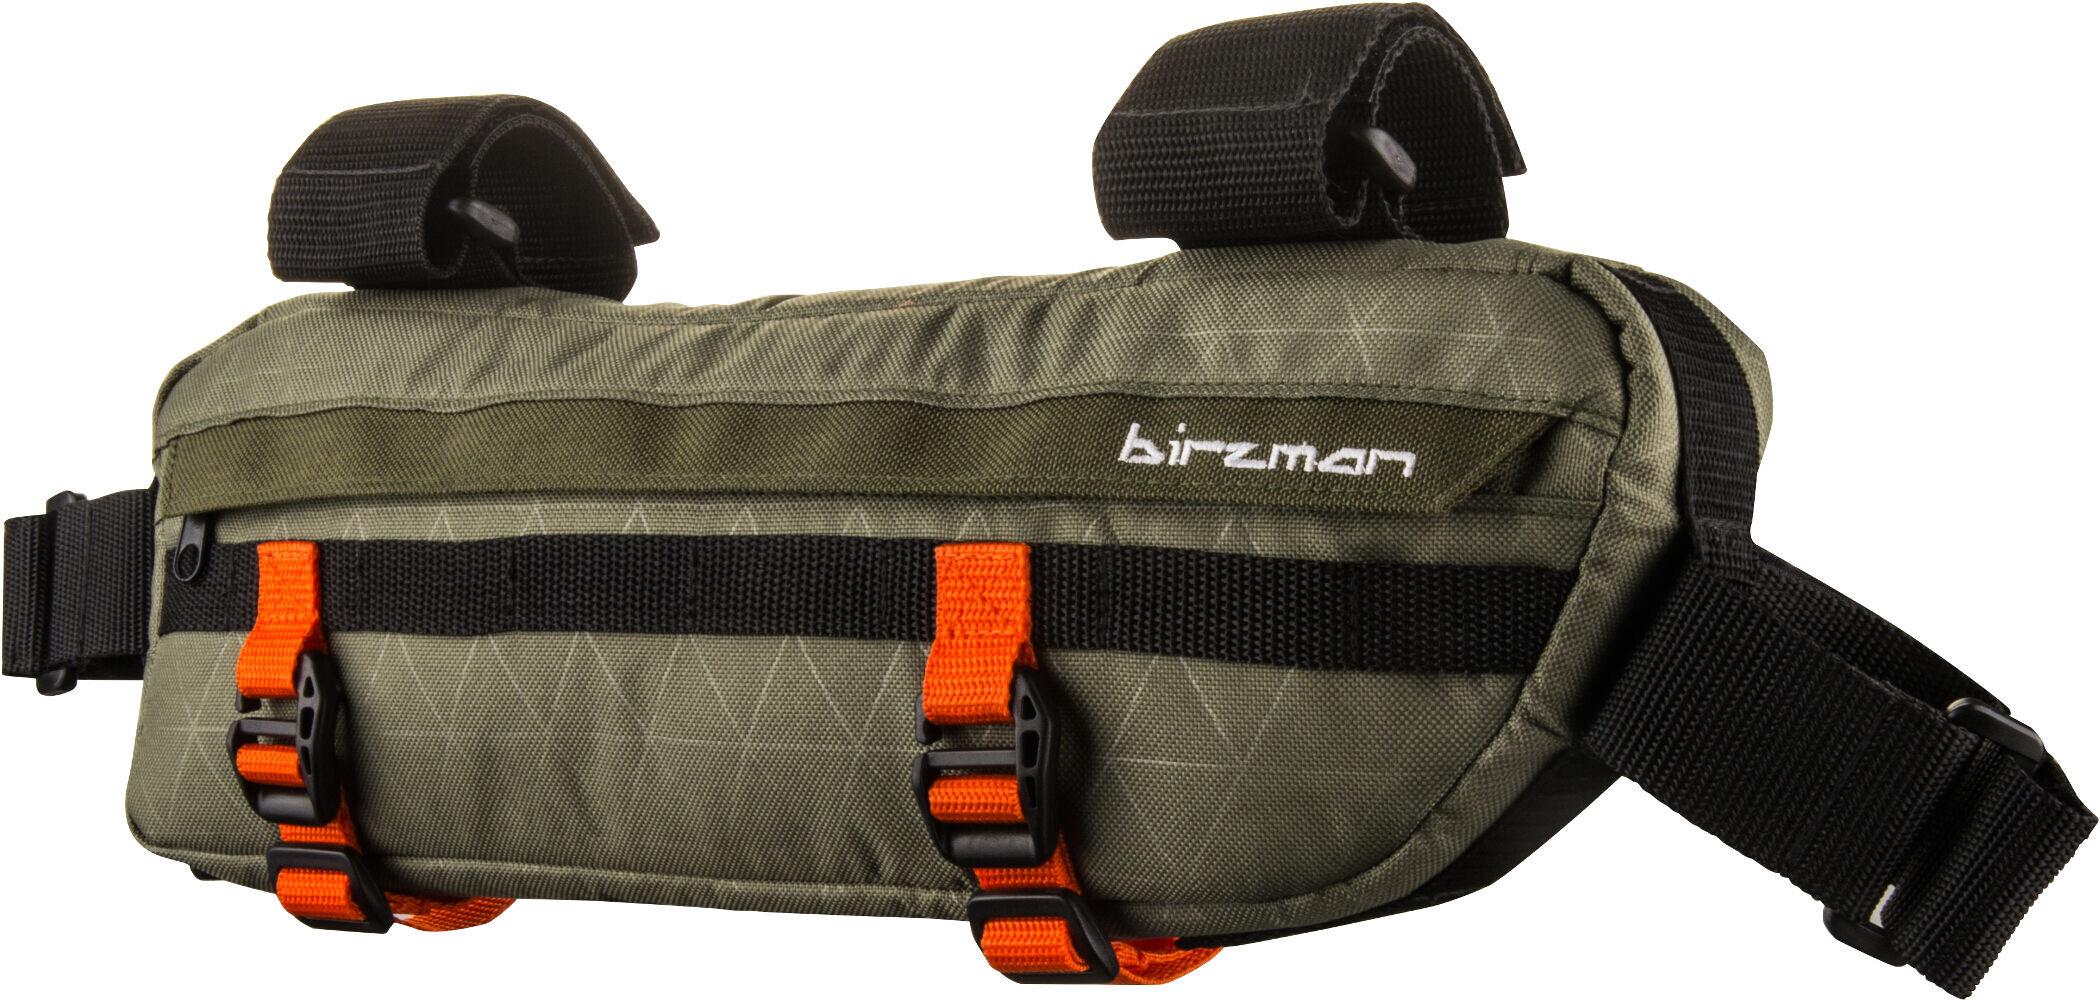 Birzman Packman Travel Planet Cykeltaske, olive (2019) | Frame bags